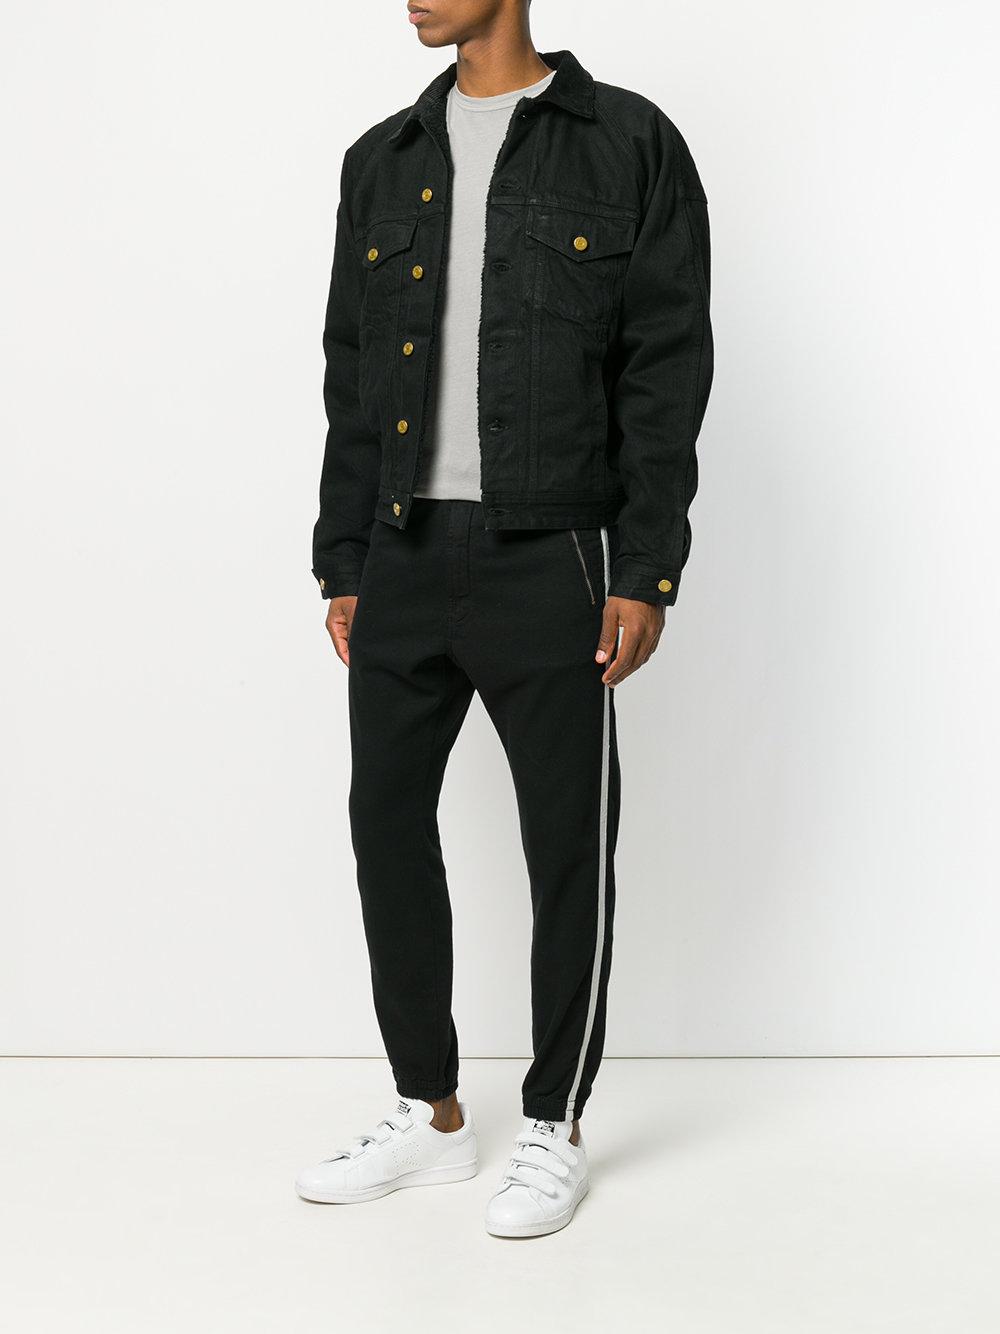 black jeans jacket